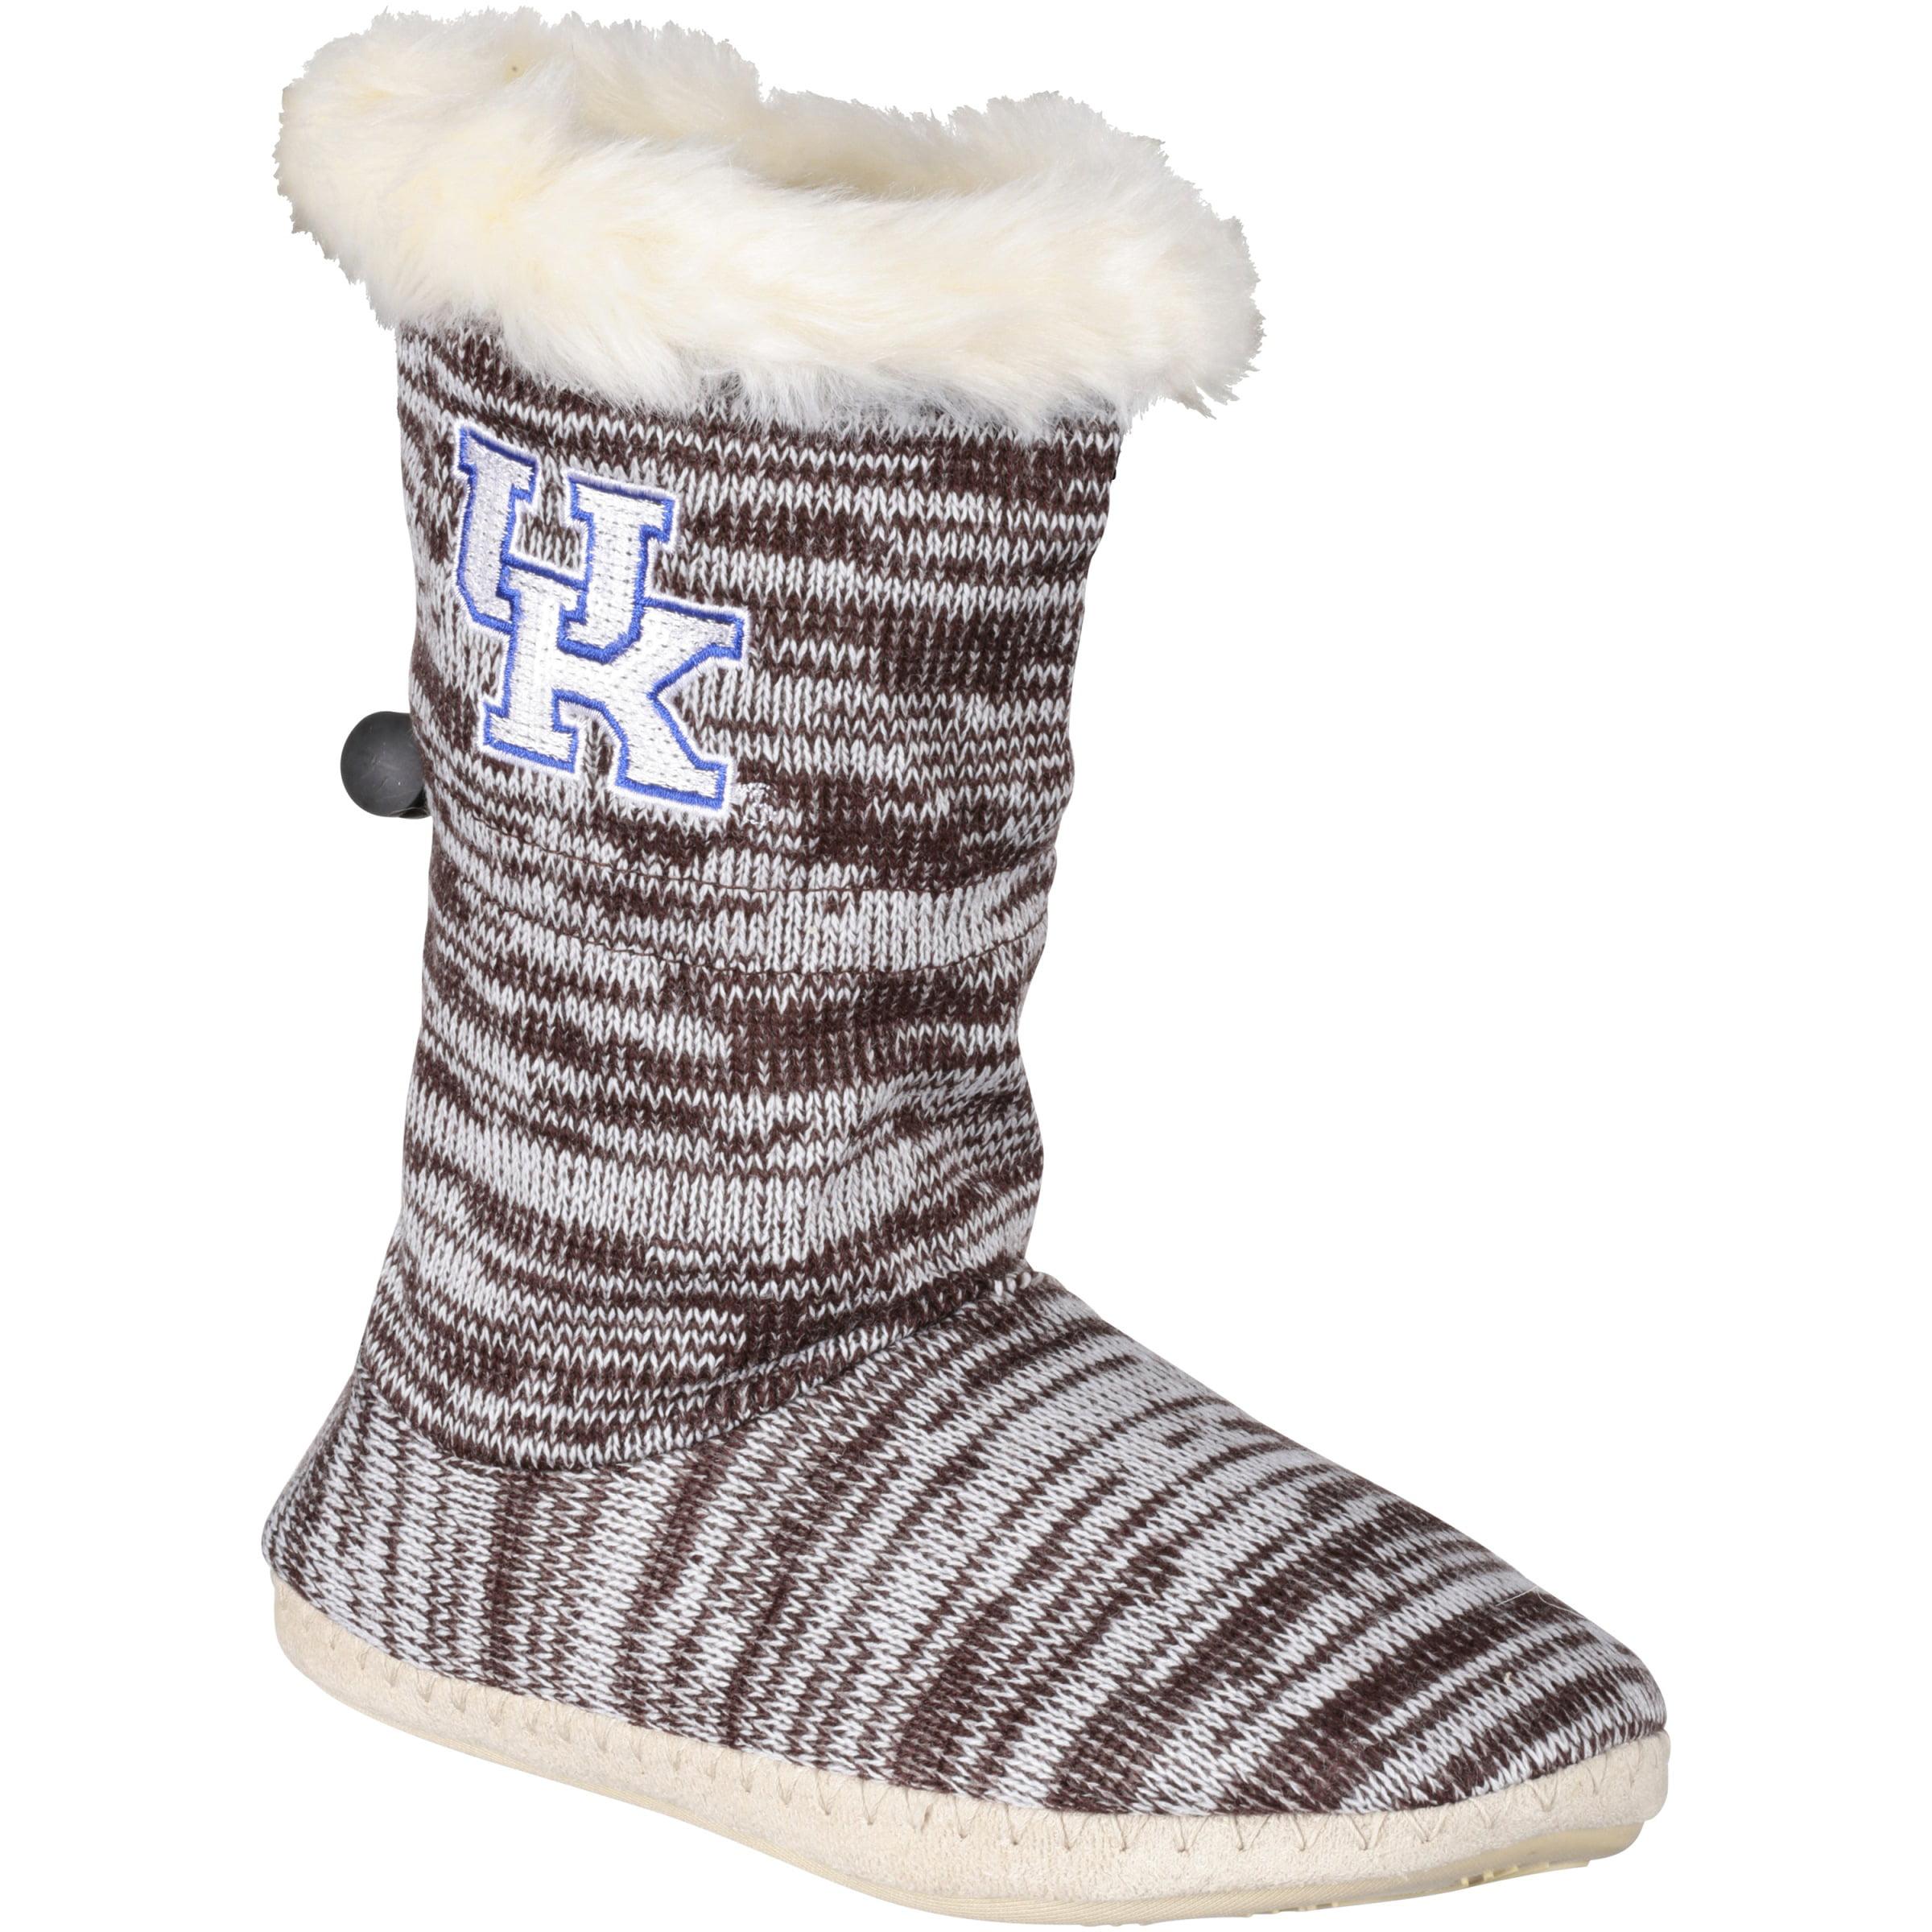 Collegiate Footwear University of Kentucky Boot Slippers 1 pr.